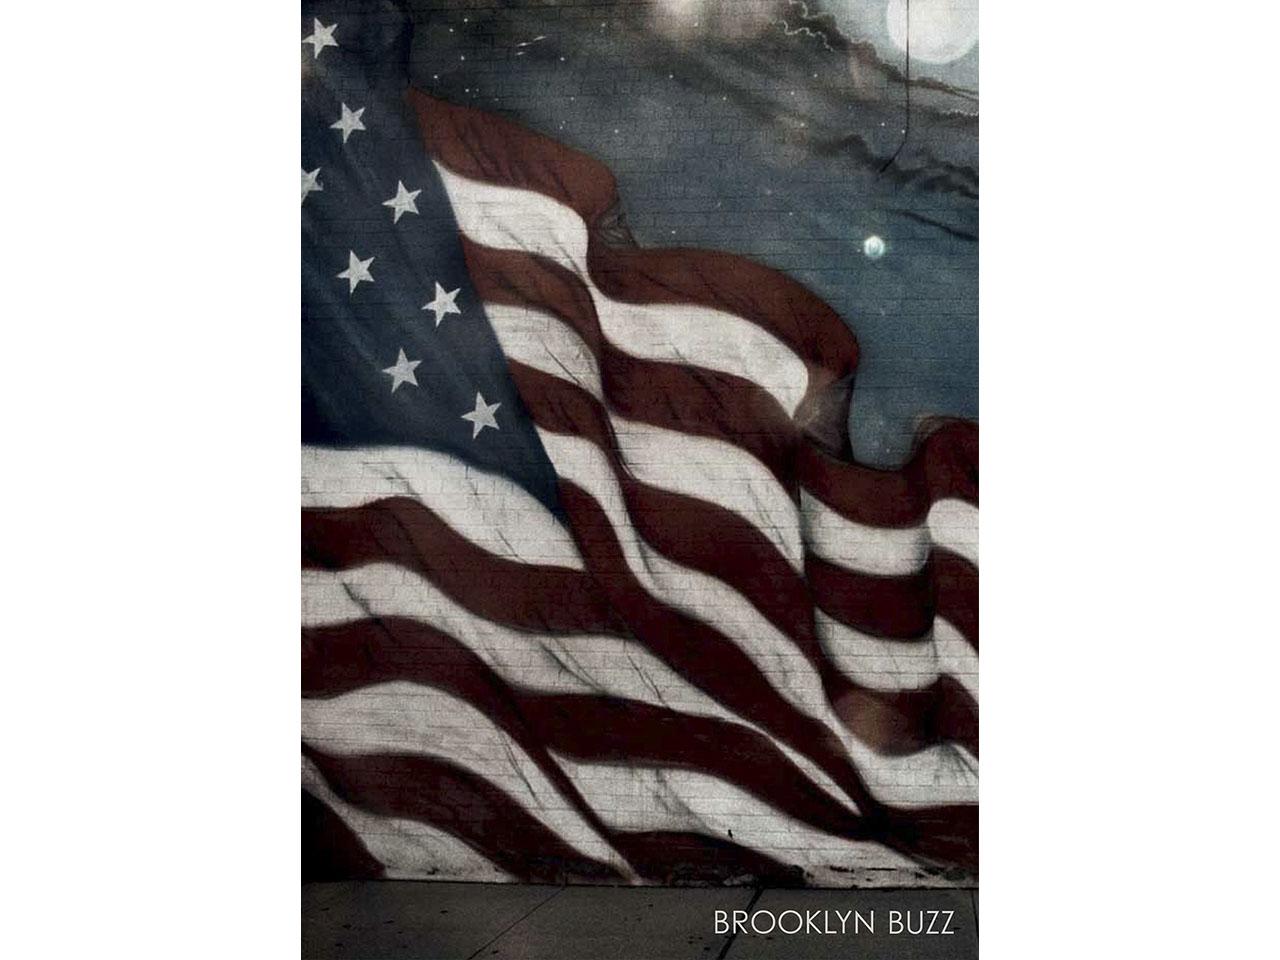 BROOKLYN_BUZZ_BOOK_COVER_WEB.jpg